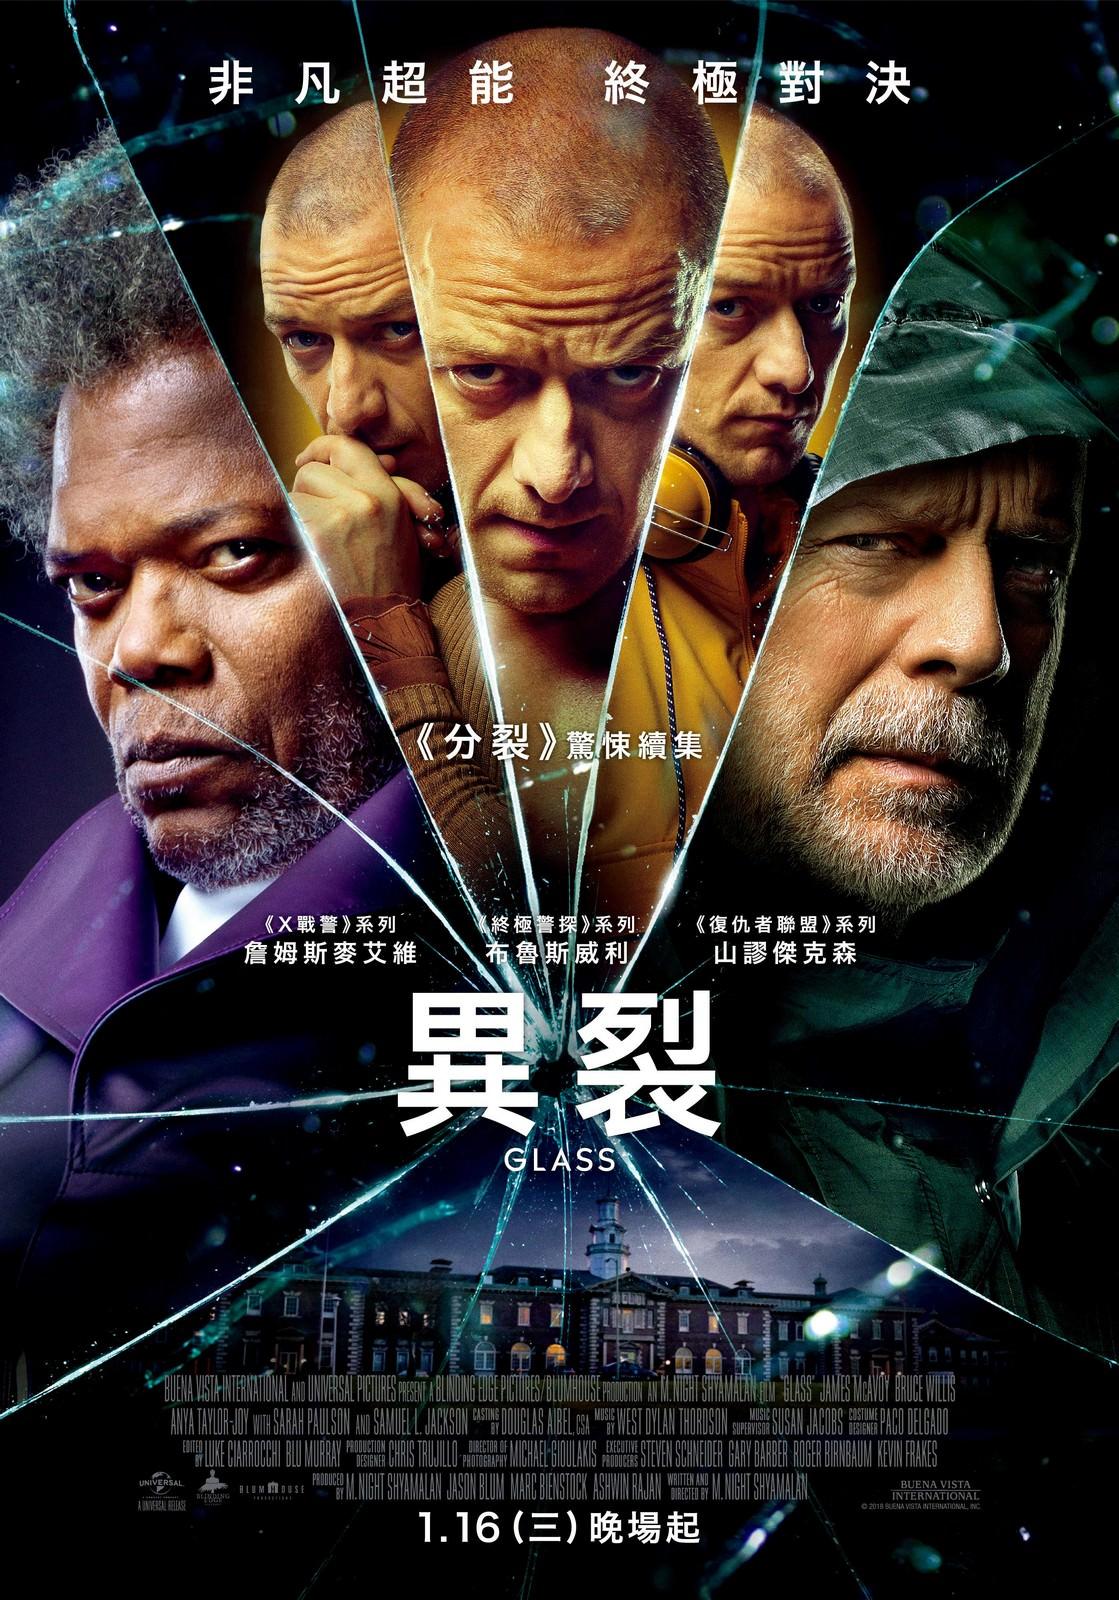 Movie, Glass(美國, 2019年) / 異裂(台灣) / 異能仨(香港) / 玻璃先生(網路), 電影海報, 台灣